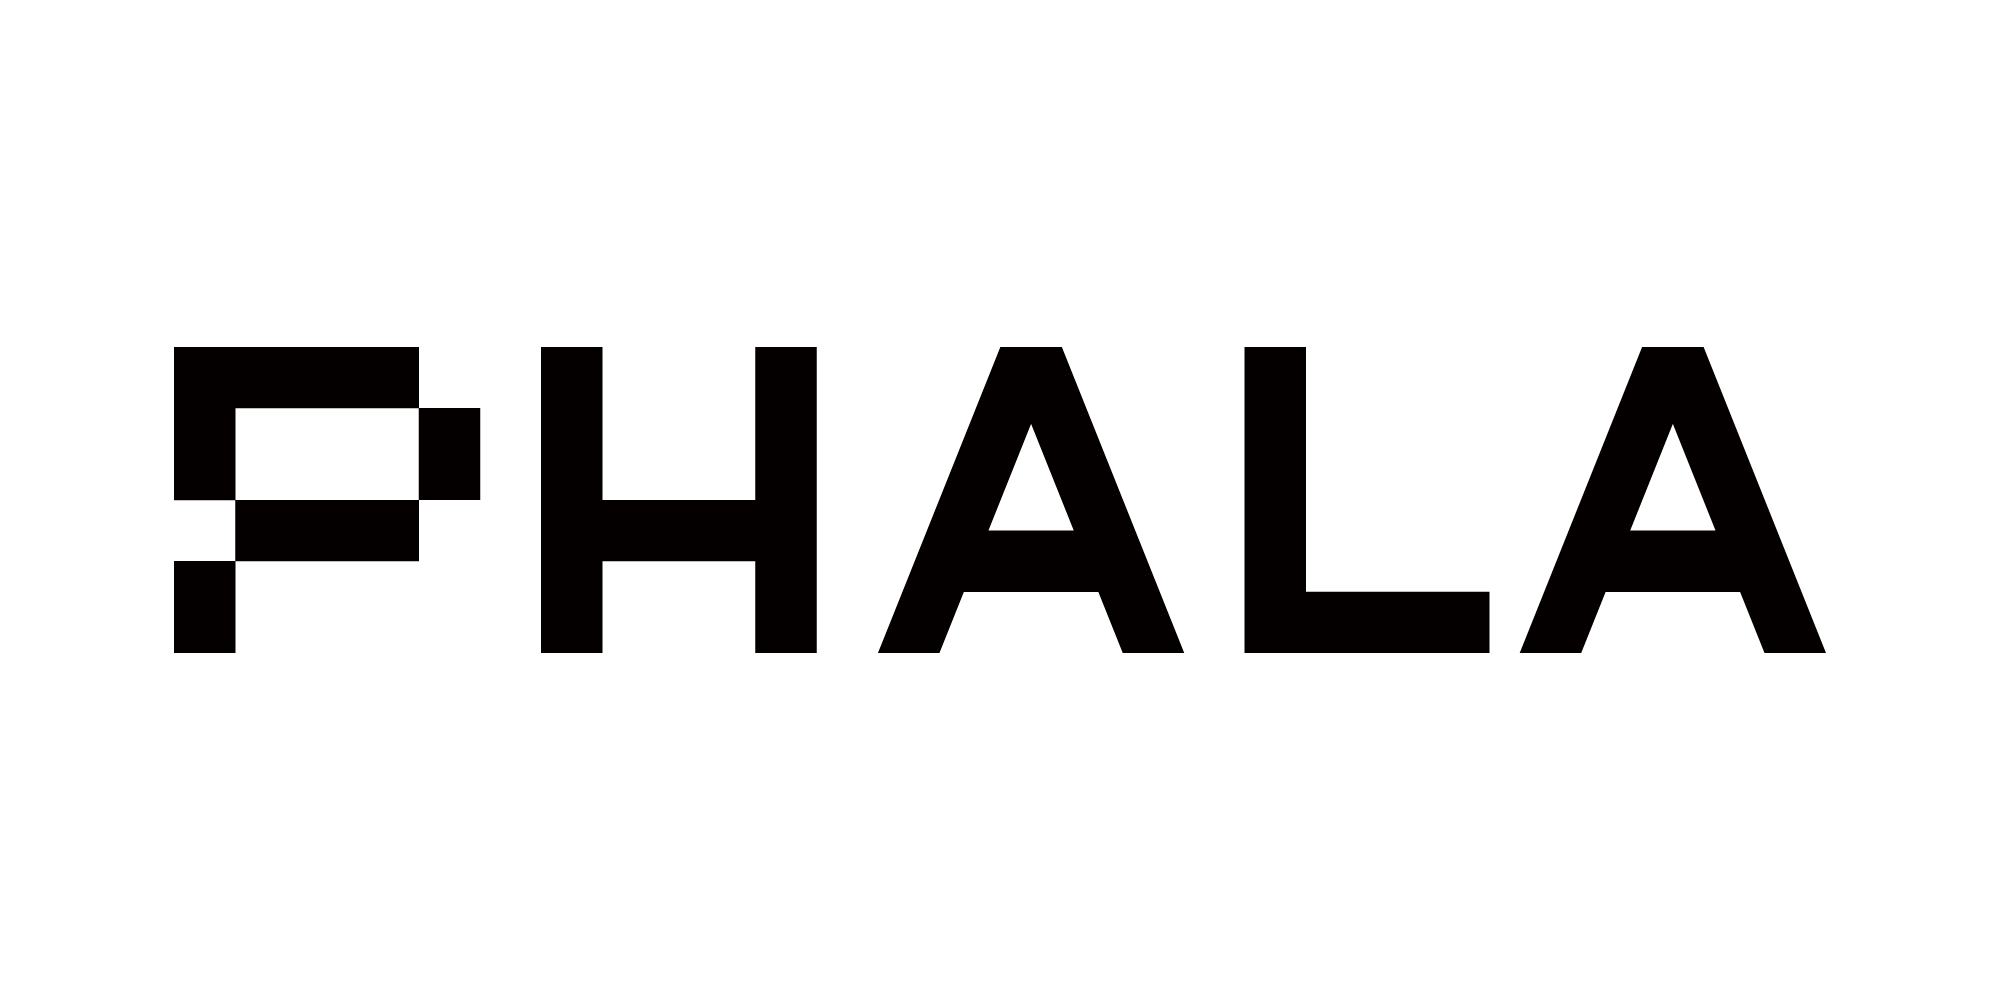 Phala Community